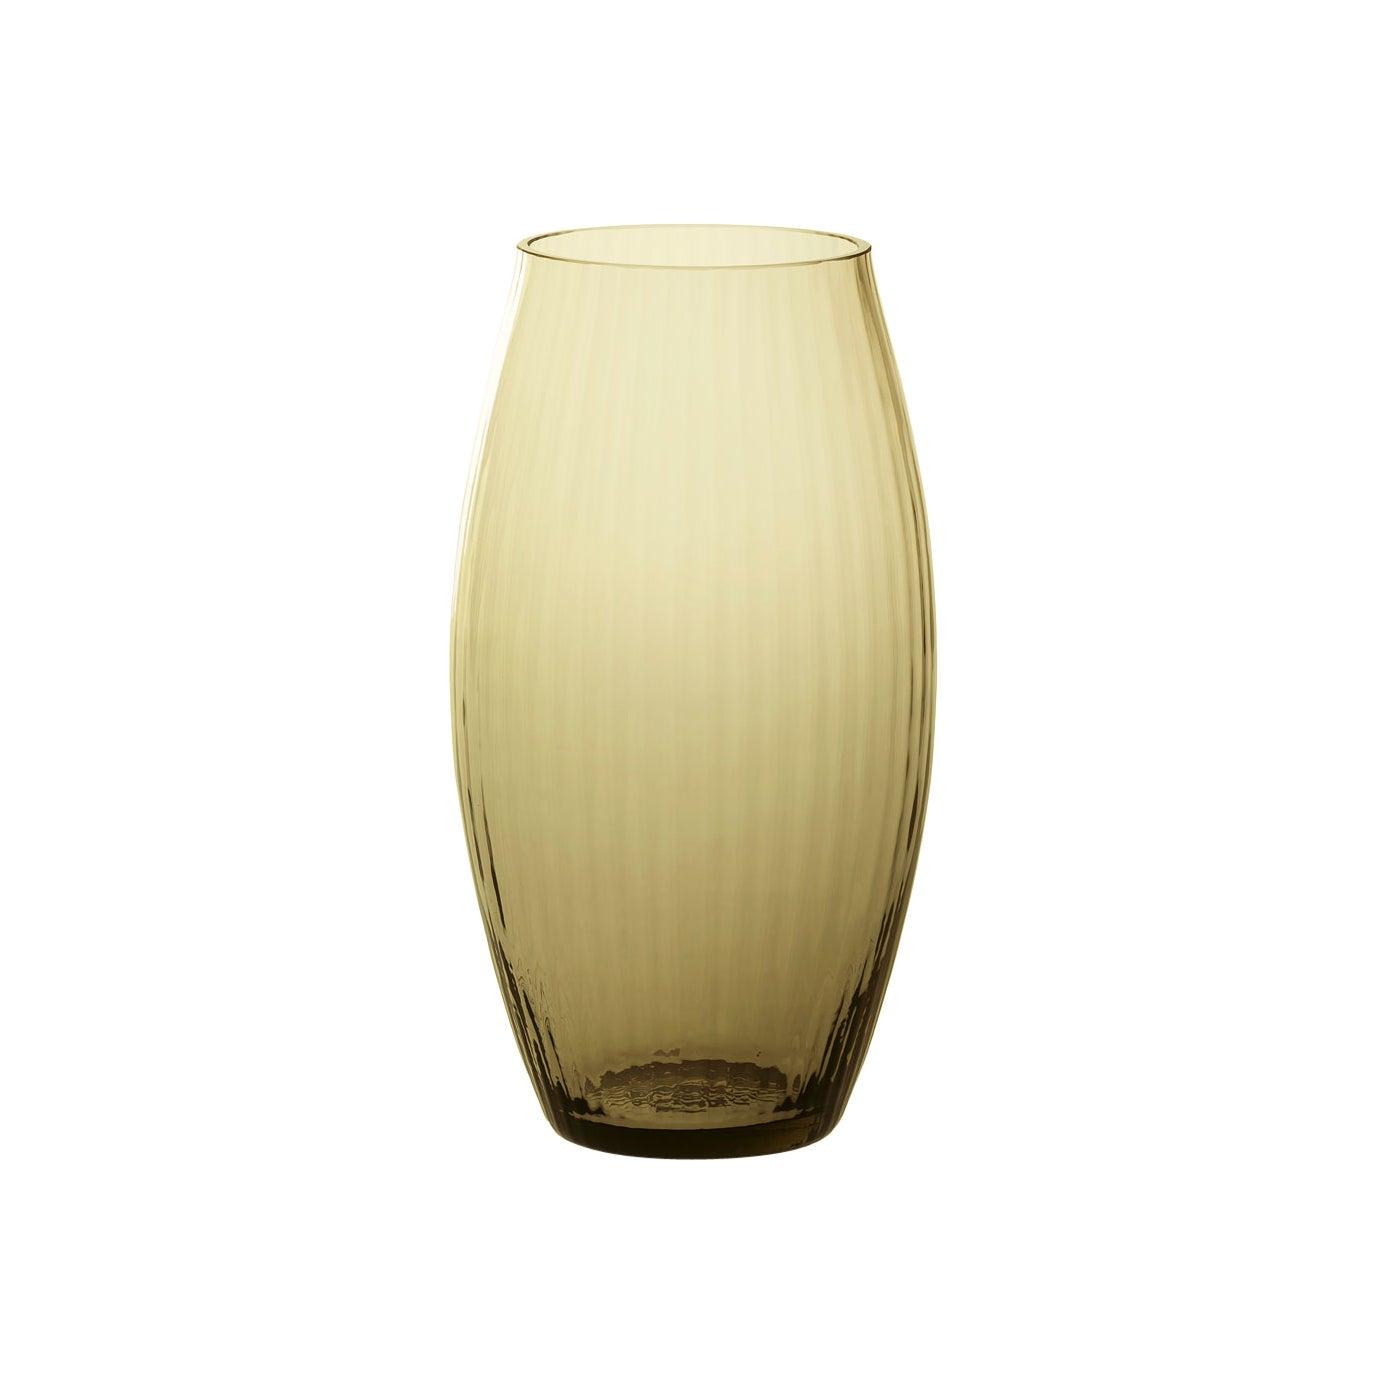 Vaso Ovale32, Vase Handcrafted Muranese Glass, Angora Plisse MUN by VG